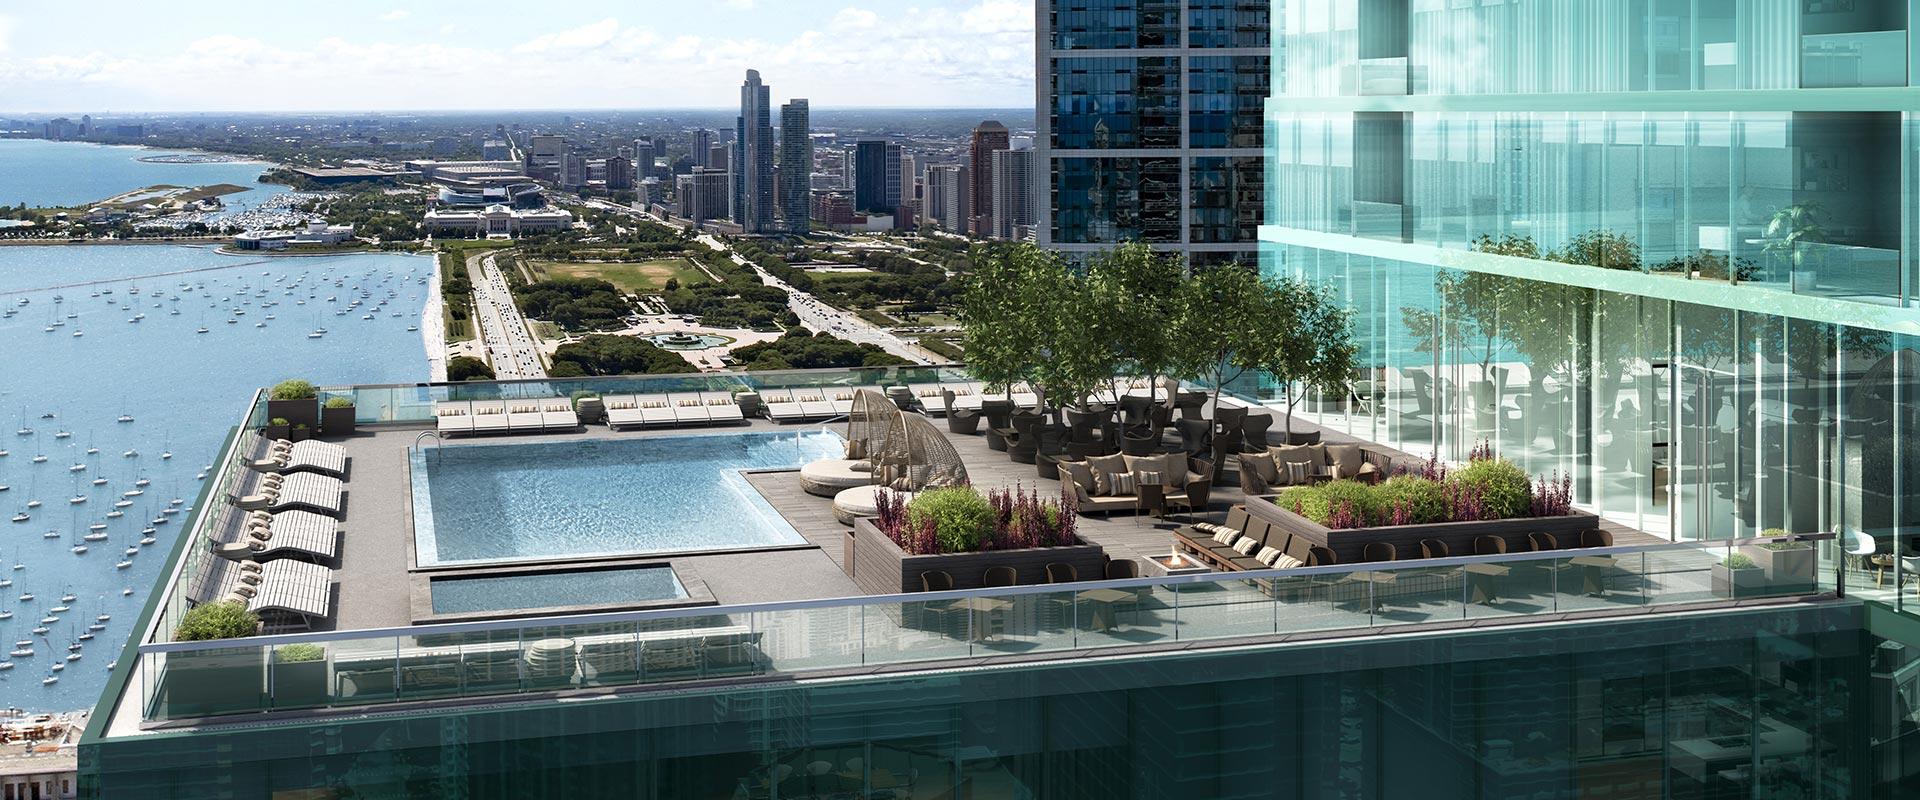 image of st. regis roof deck